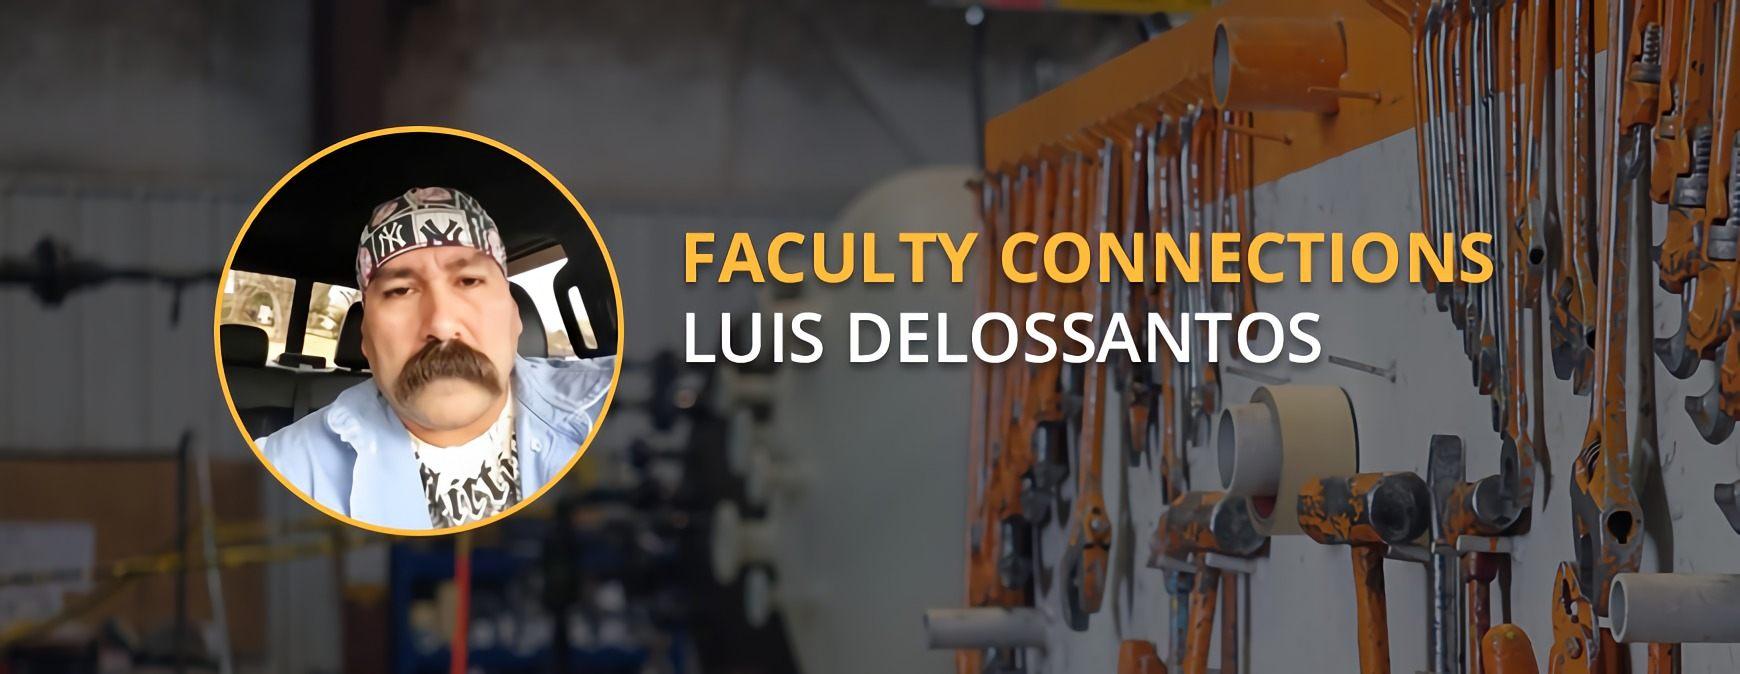 Luis Delossantos faculty connections